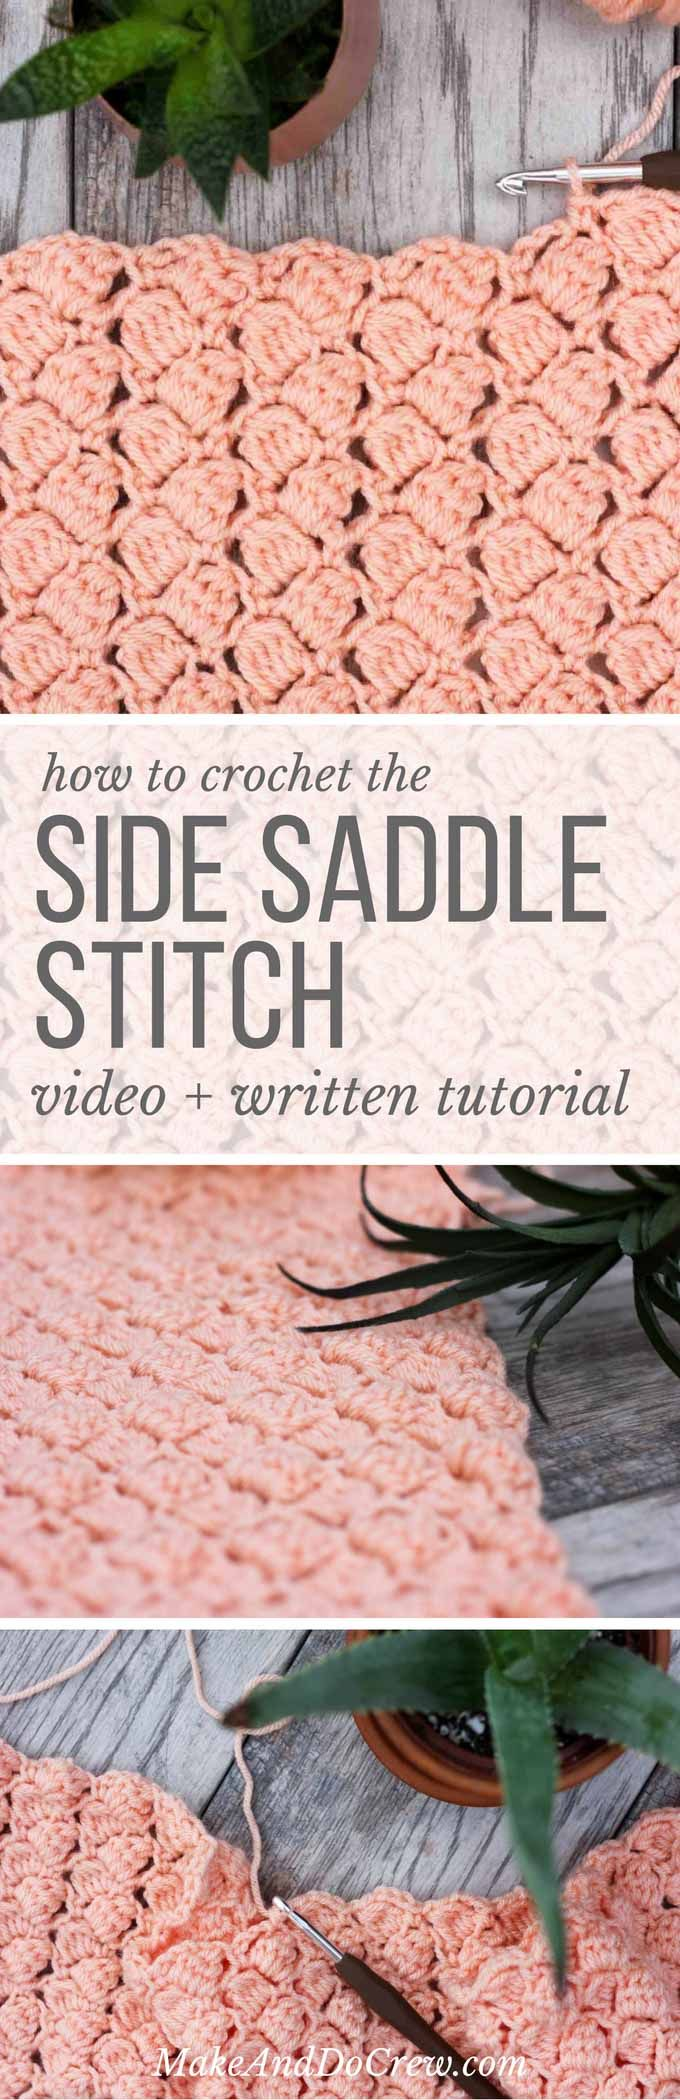 Video Tutorial: How to Crochet the Side Saddle Stitch | Häkeln ...